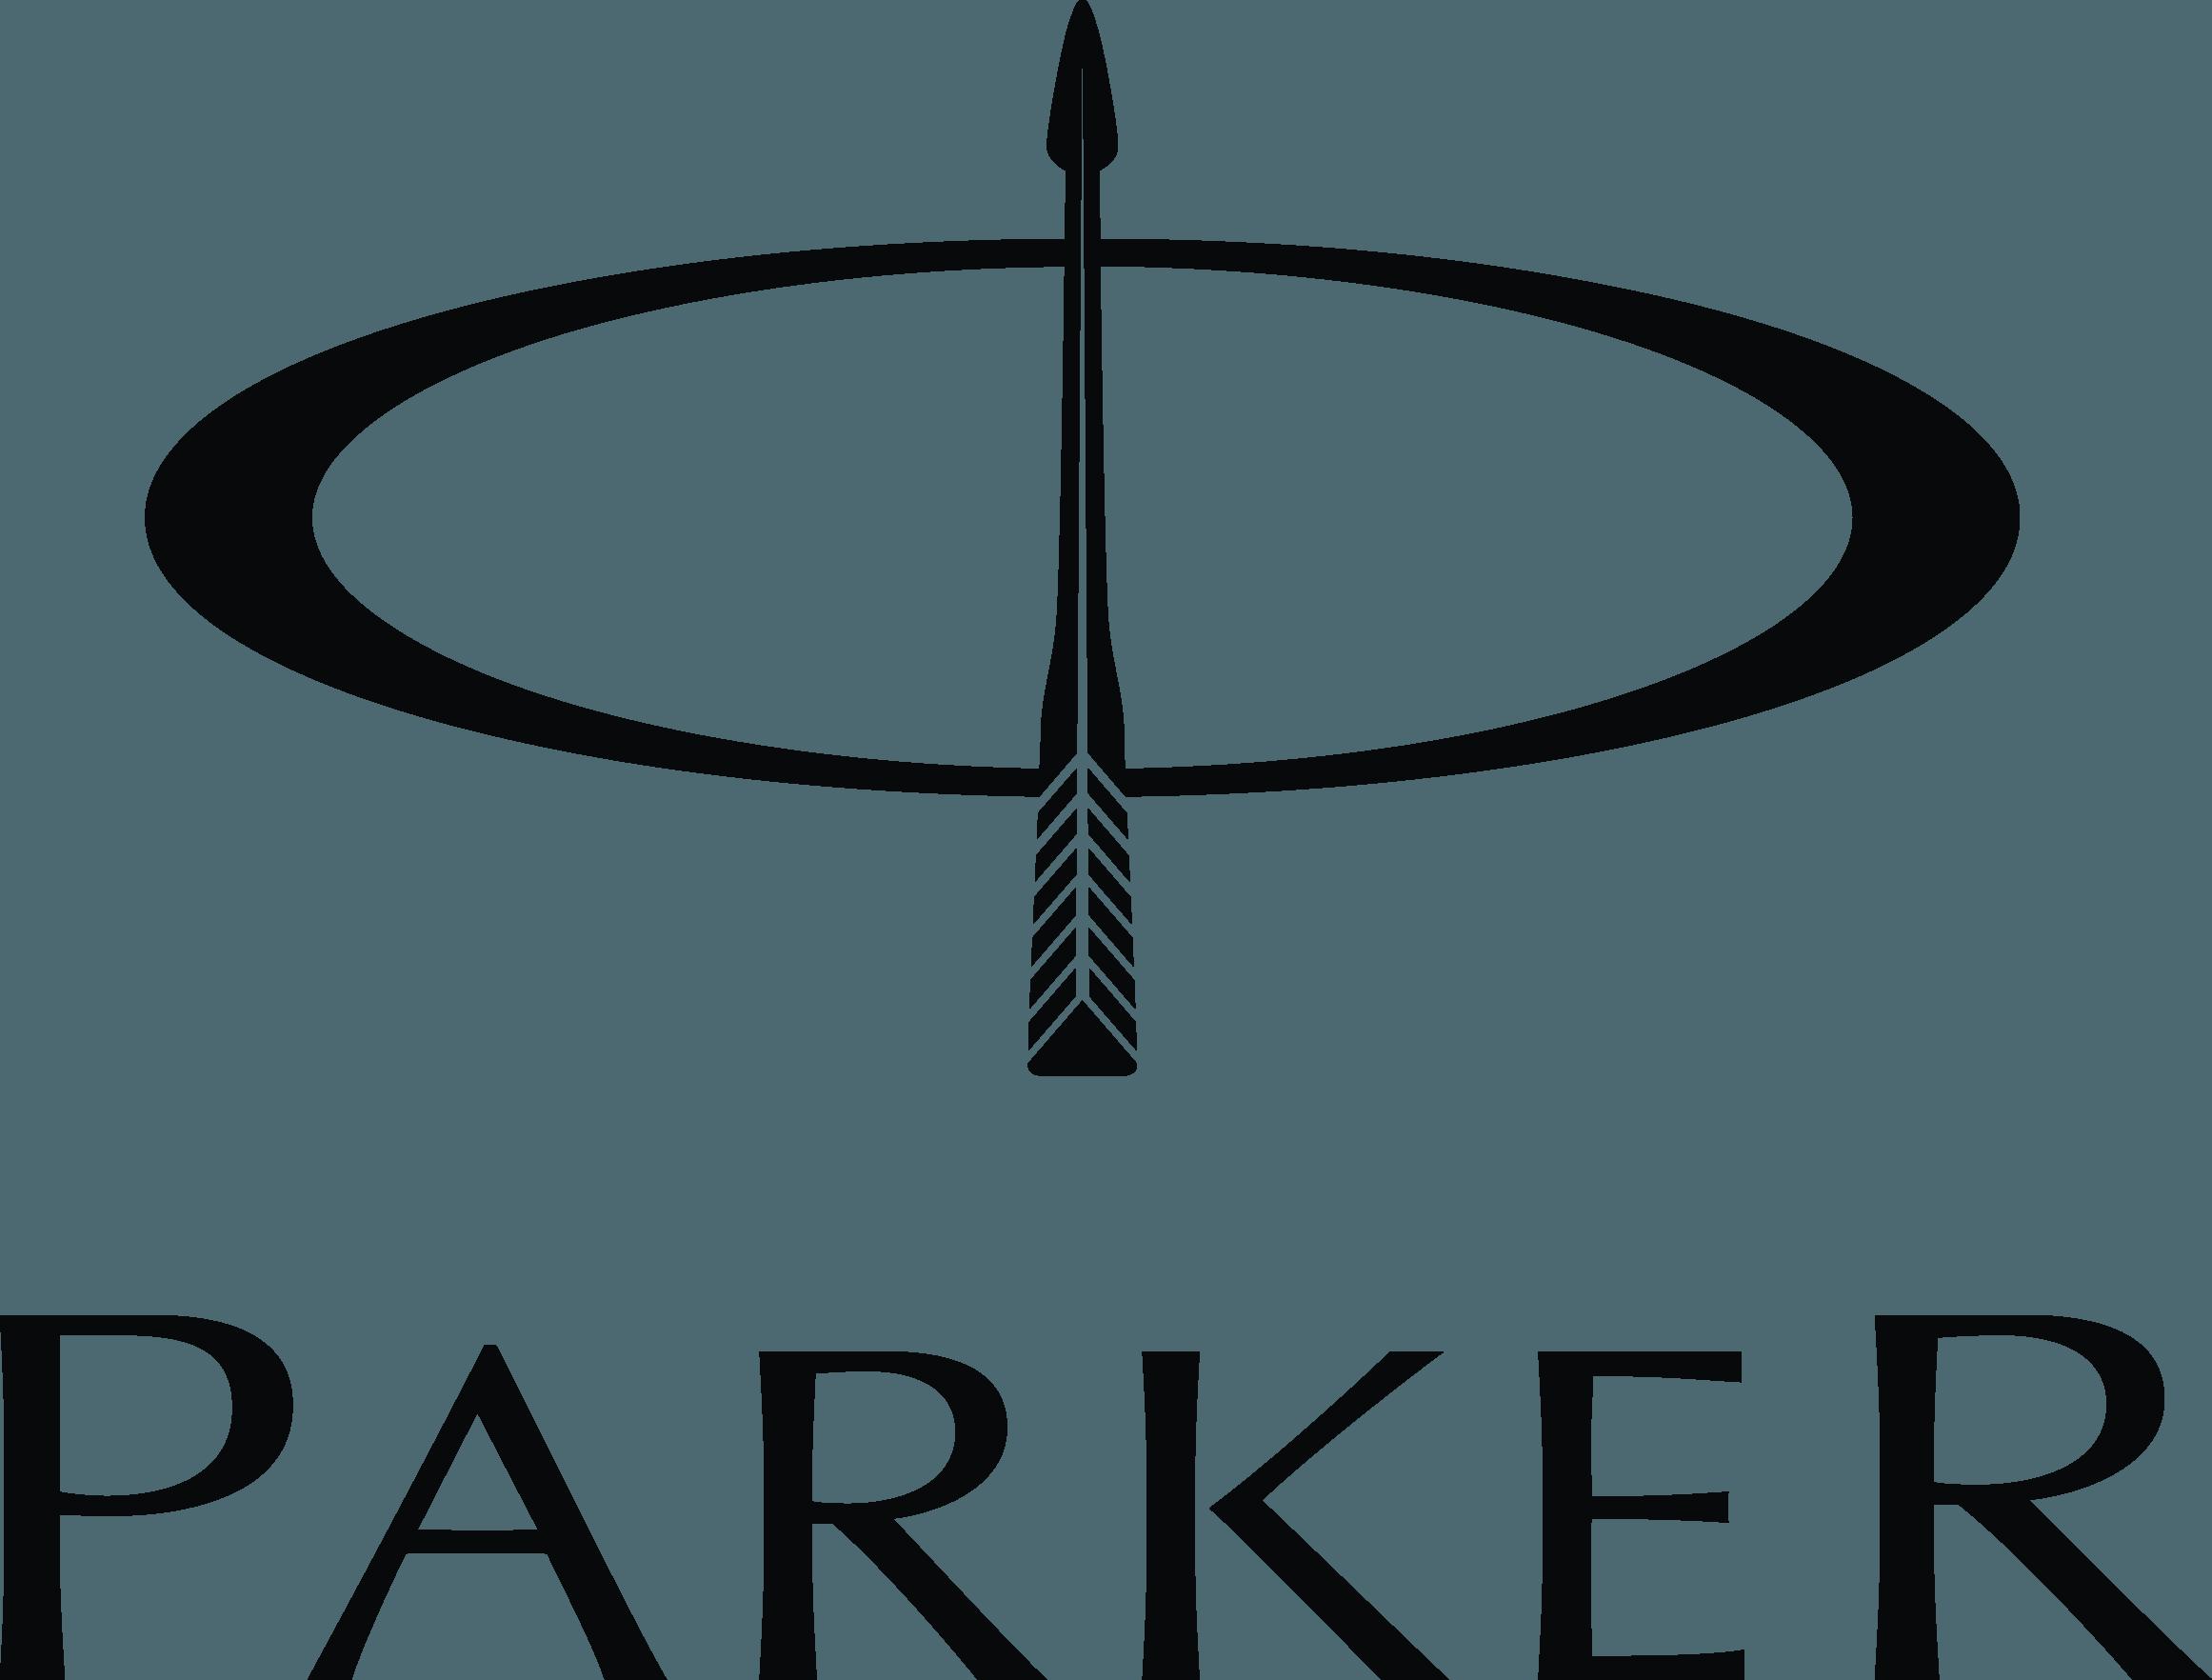 Parker Logo (Pen) png